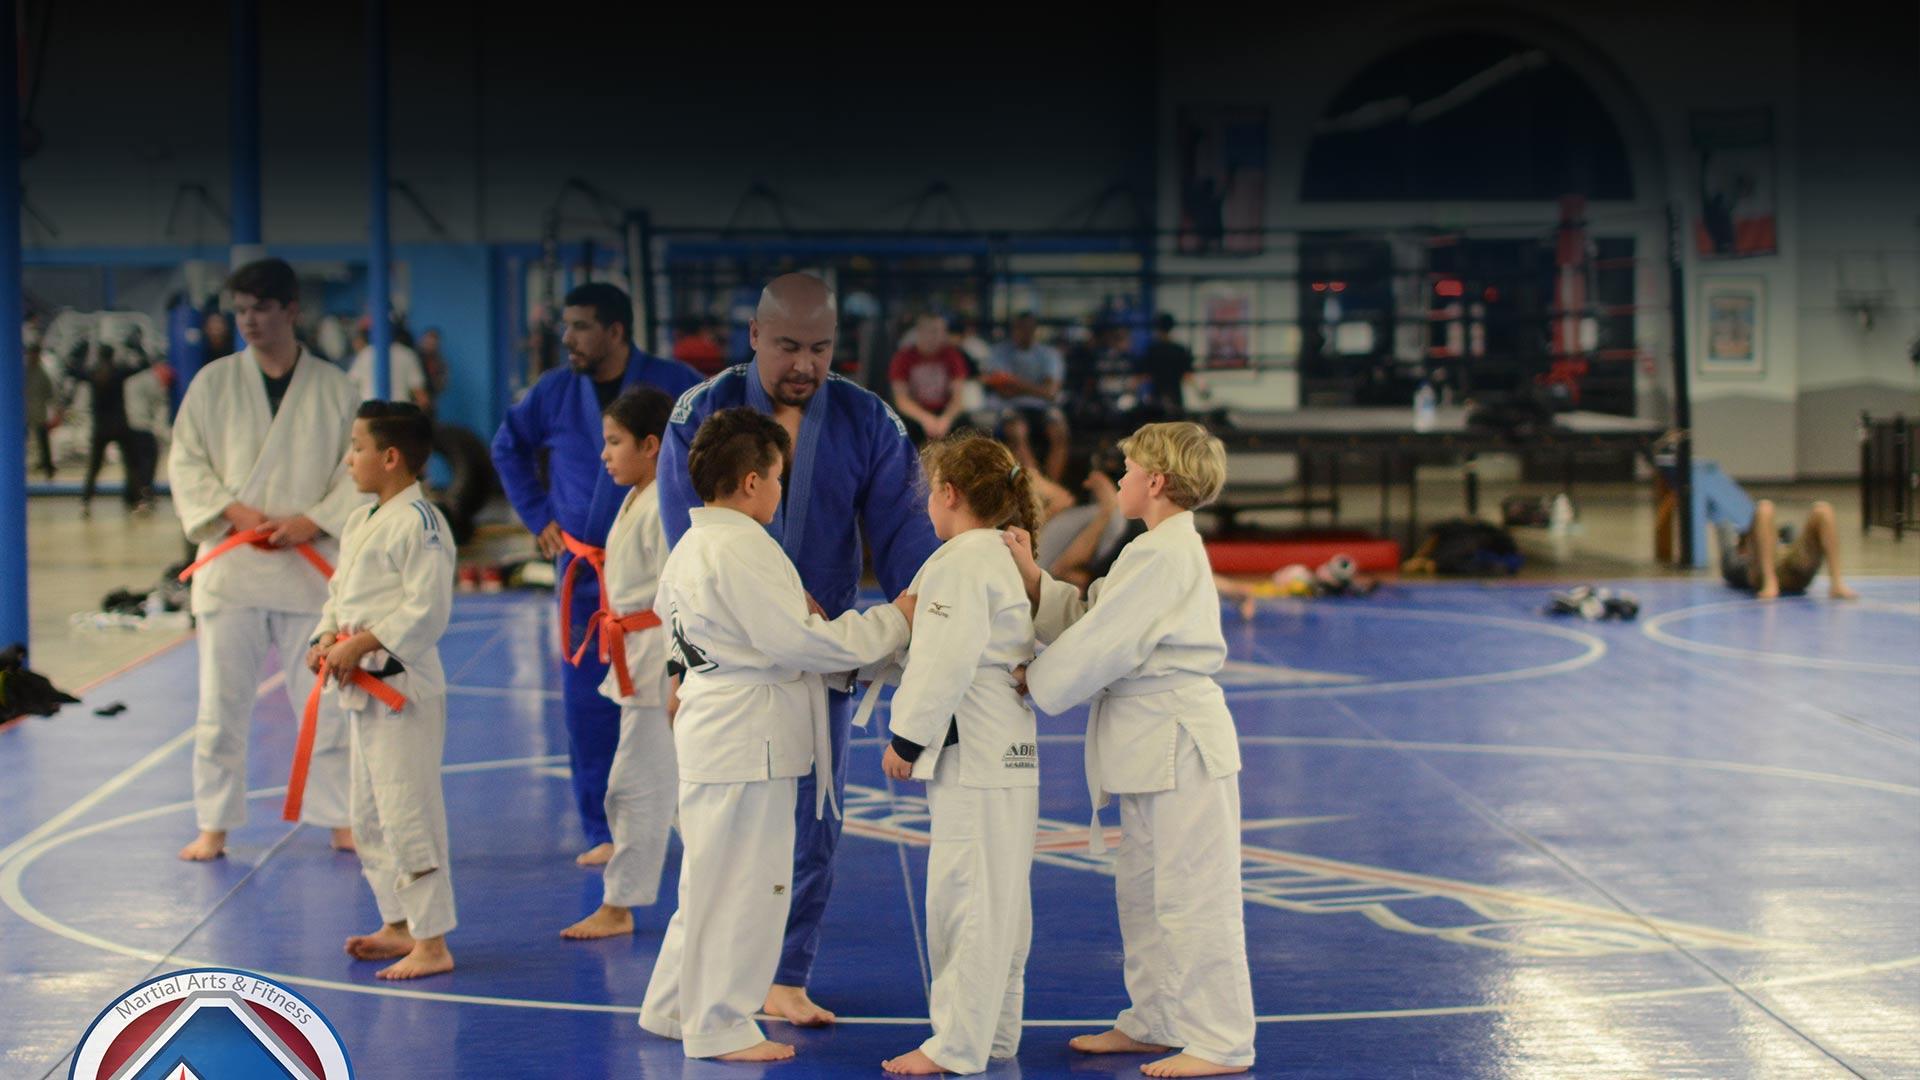 Judo Kids Class | Adrenaline | Judo San Bernardino